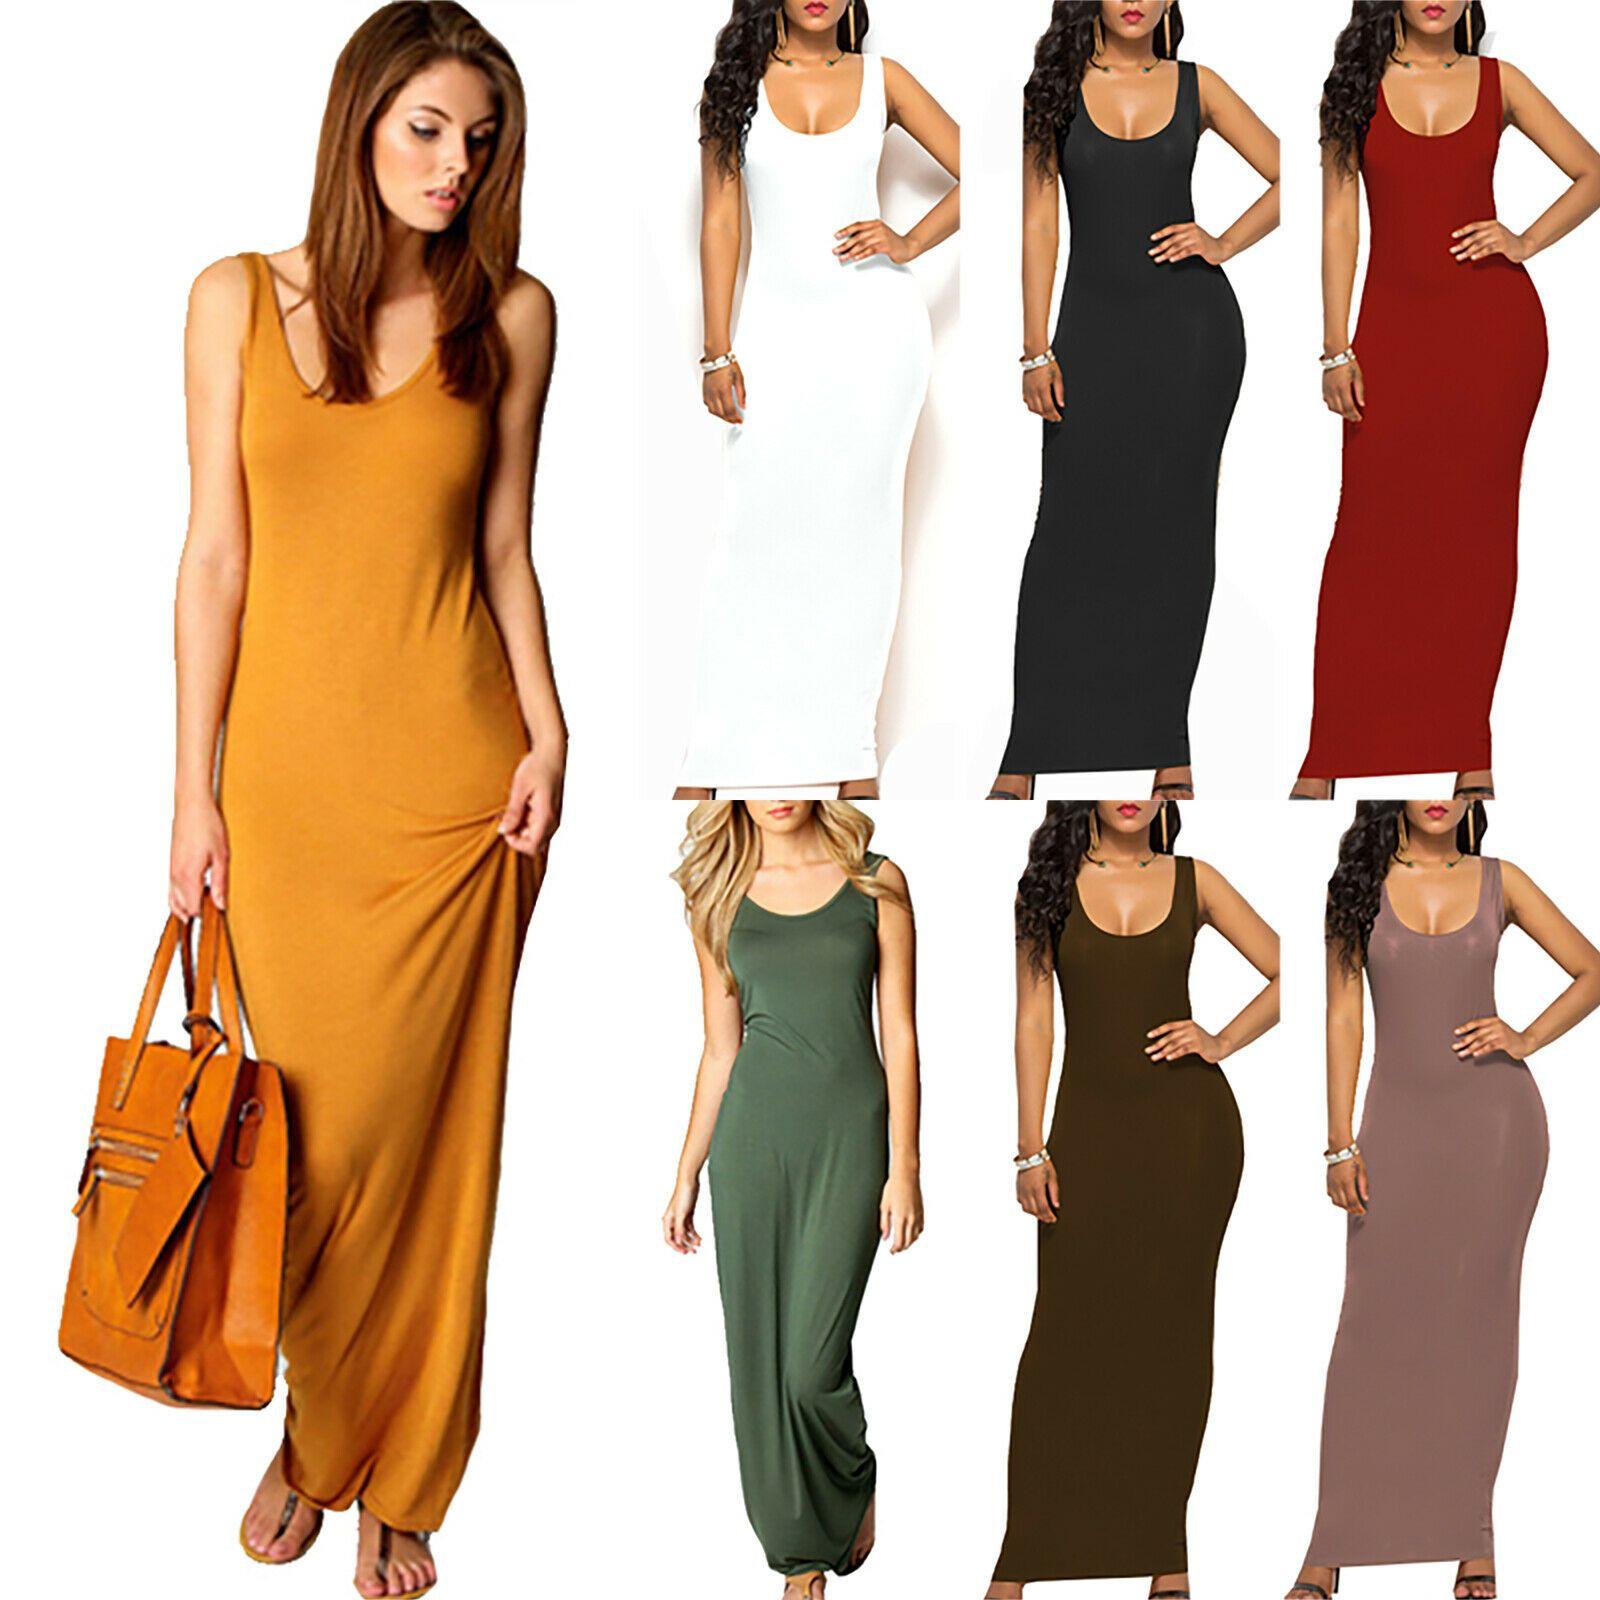 Women Sleeveless Bodycon Slip Dress Holiday Party Solid Plain Long Maxi Dress Us Long Dresses Maxi Dress Cocktail Womens Maxi Dresses Bodycon Maxi Dresses [ 1600 x 1600 Pixel ]